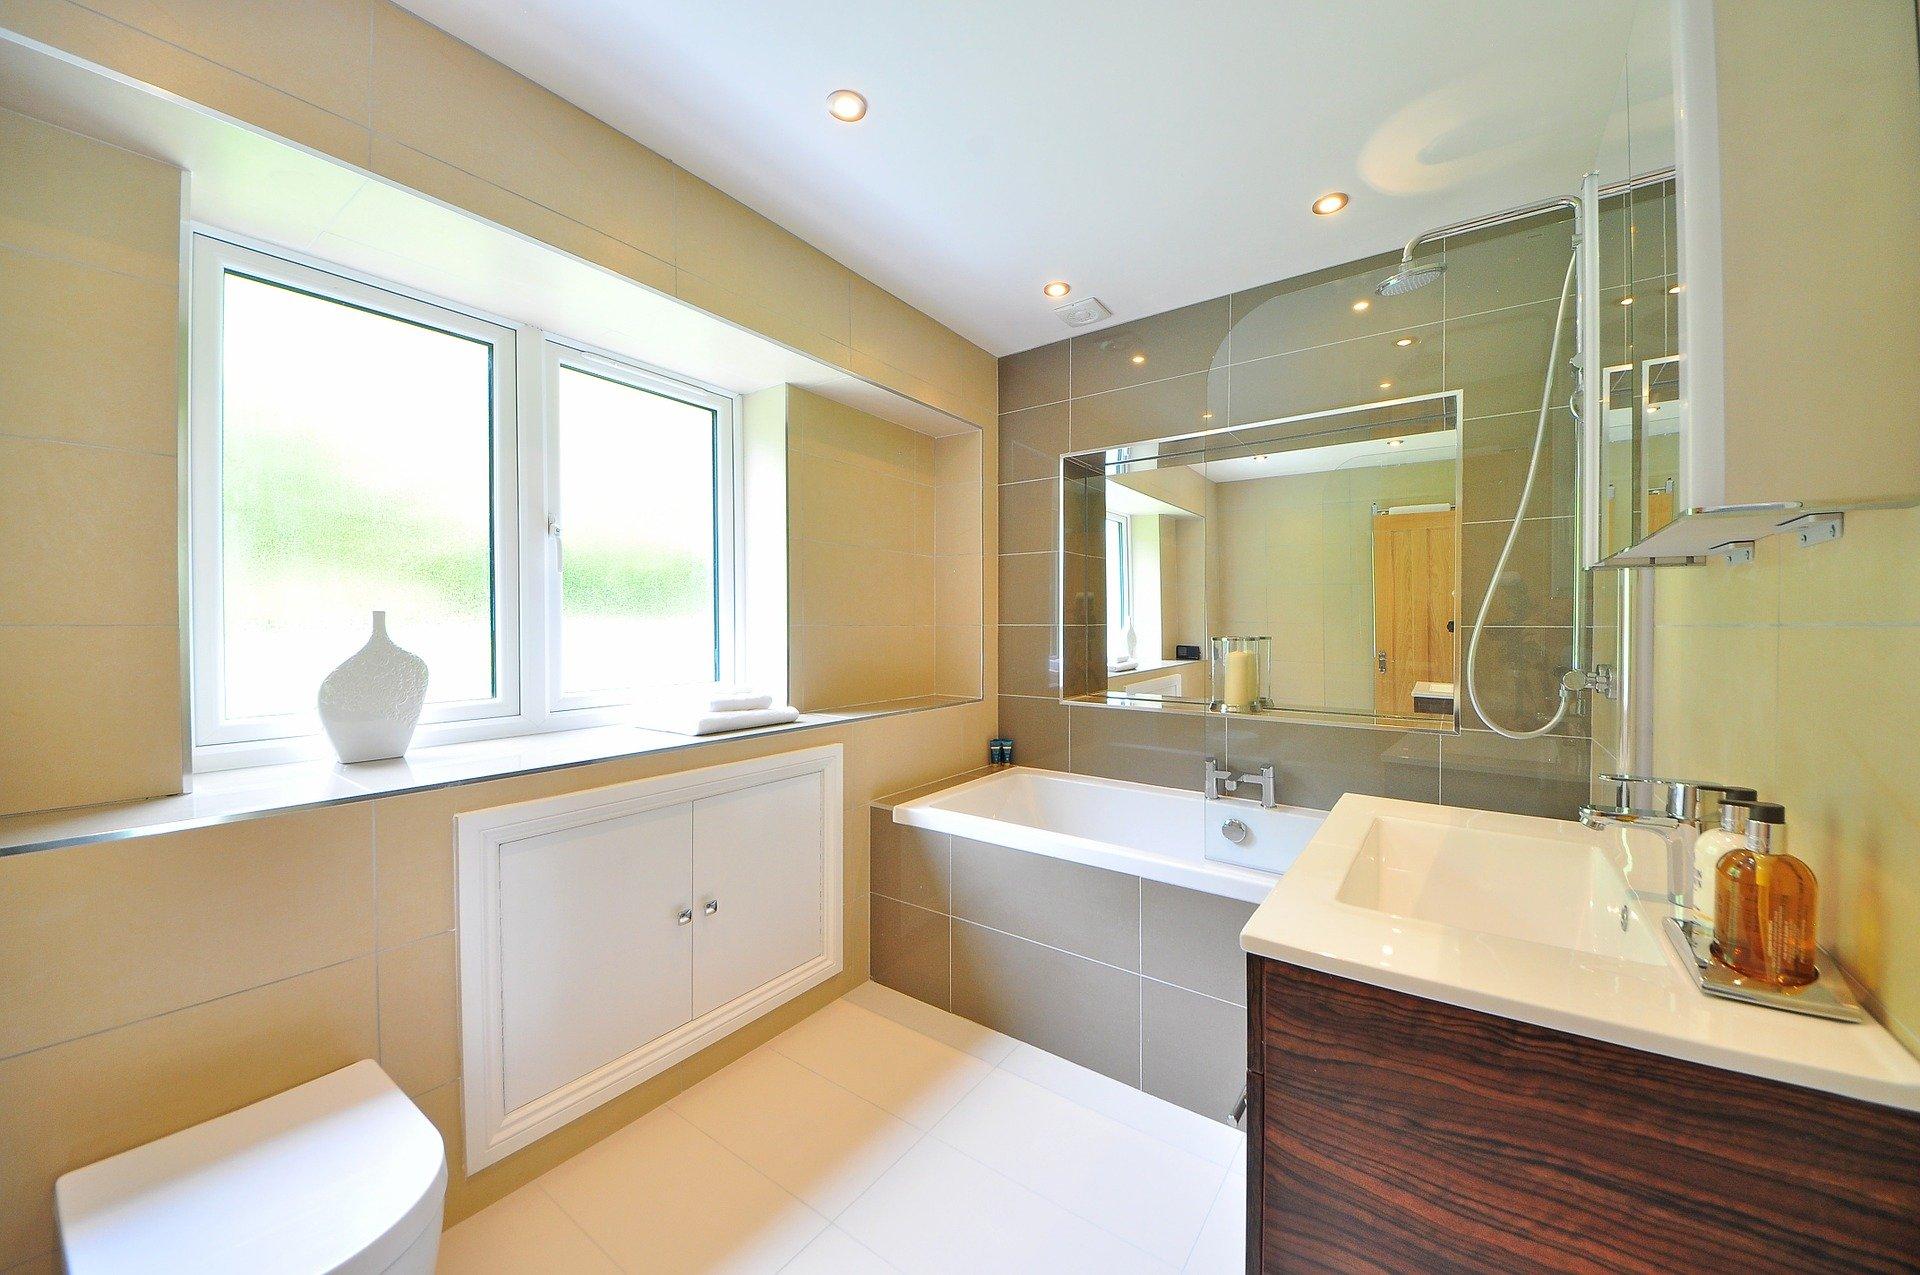 bathroom remodel, bathroom, ceiling, bathroom ceiling